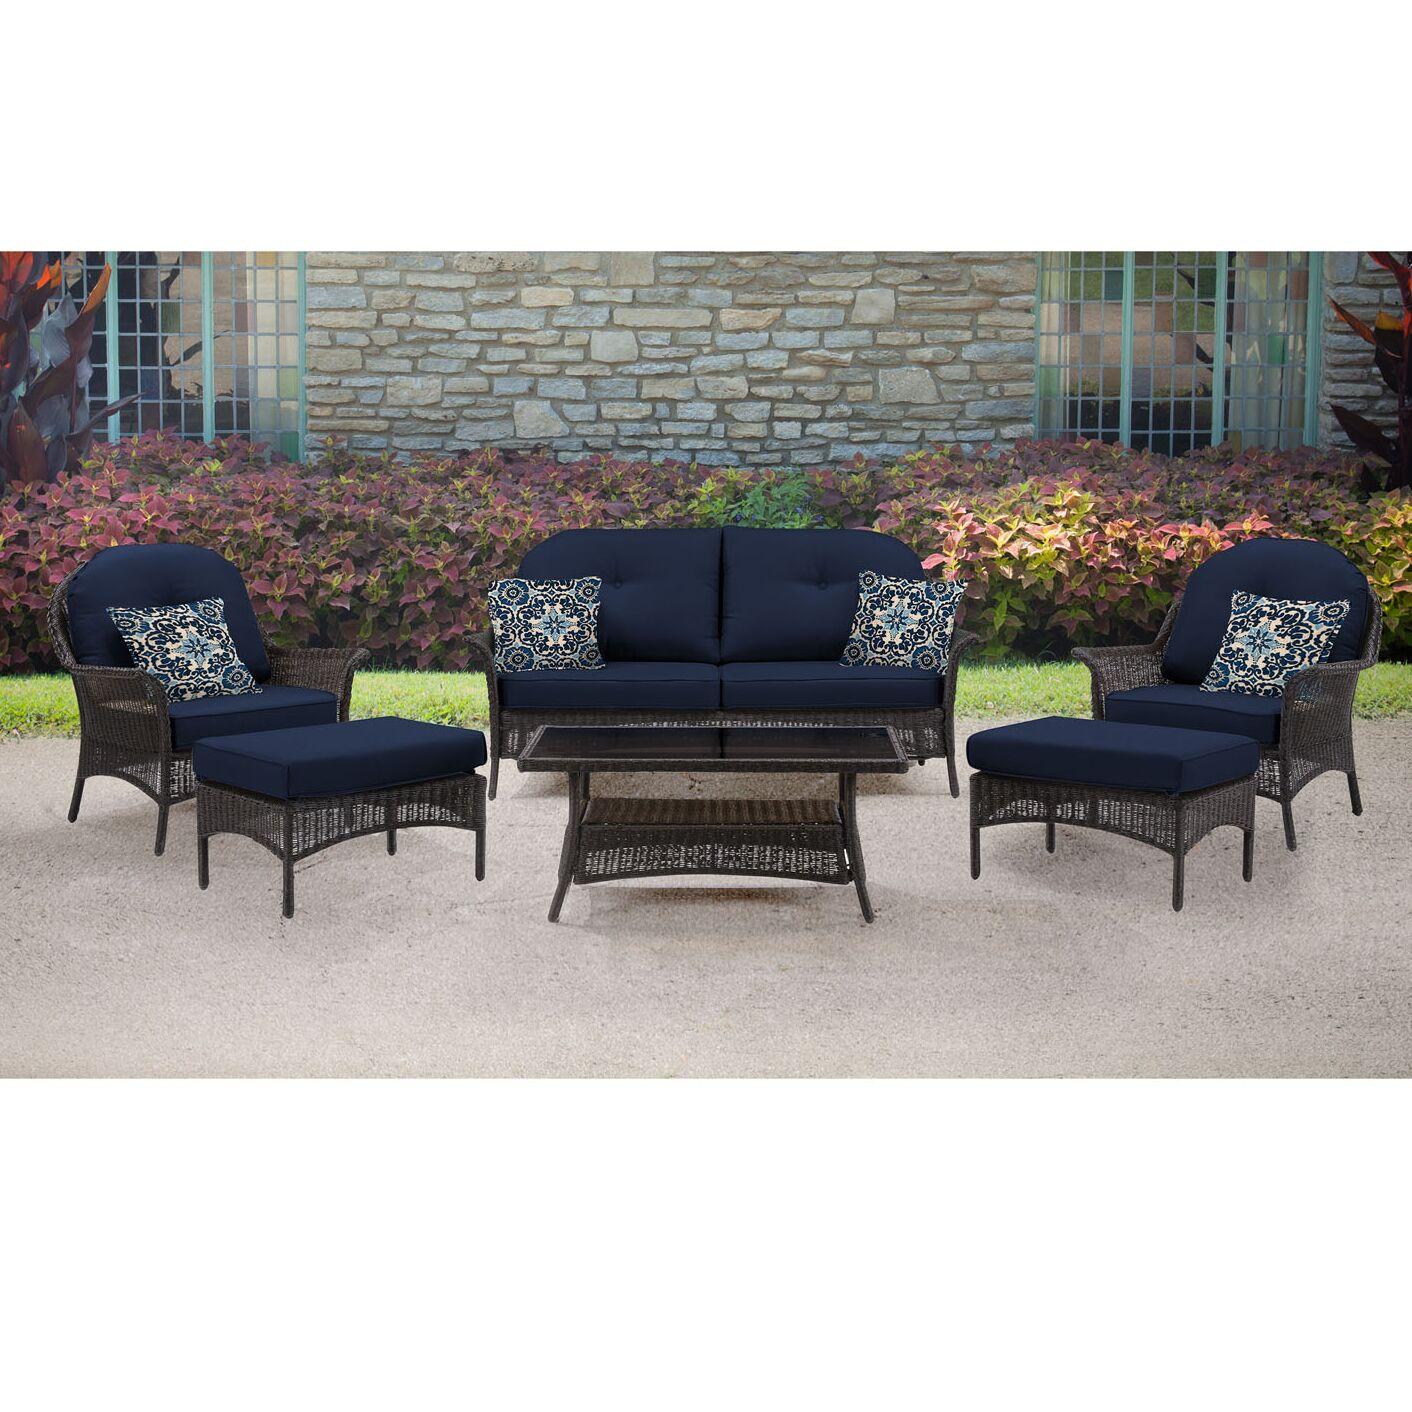 Kinnison 6 Piece Sofa Set with Cushions Fabric: Navy Blue